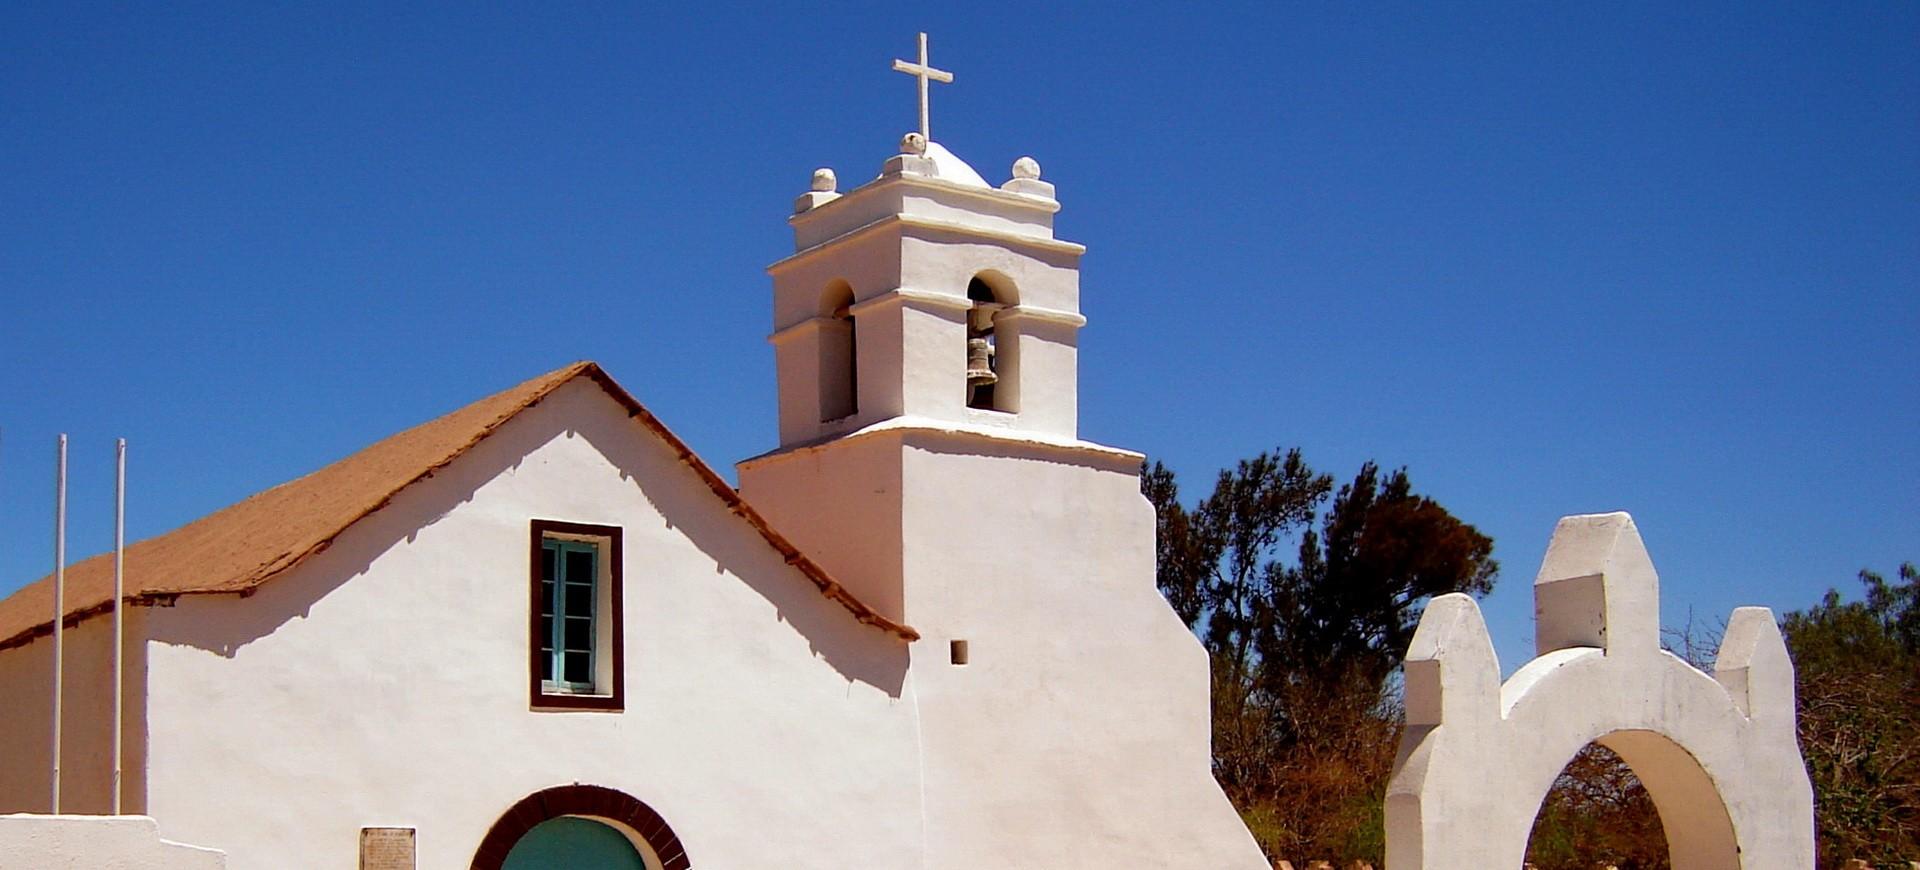 Chili Désert Atacama Eglise à San Pedro